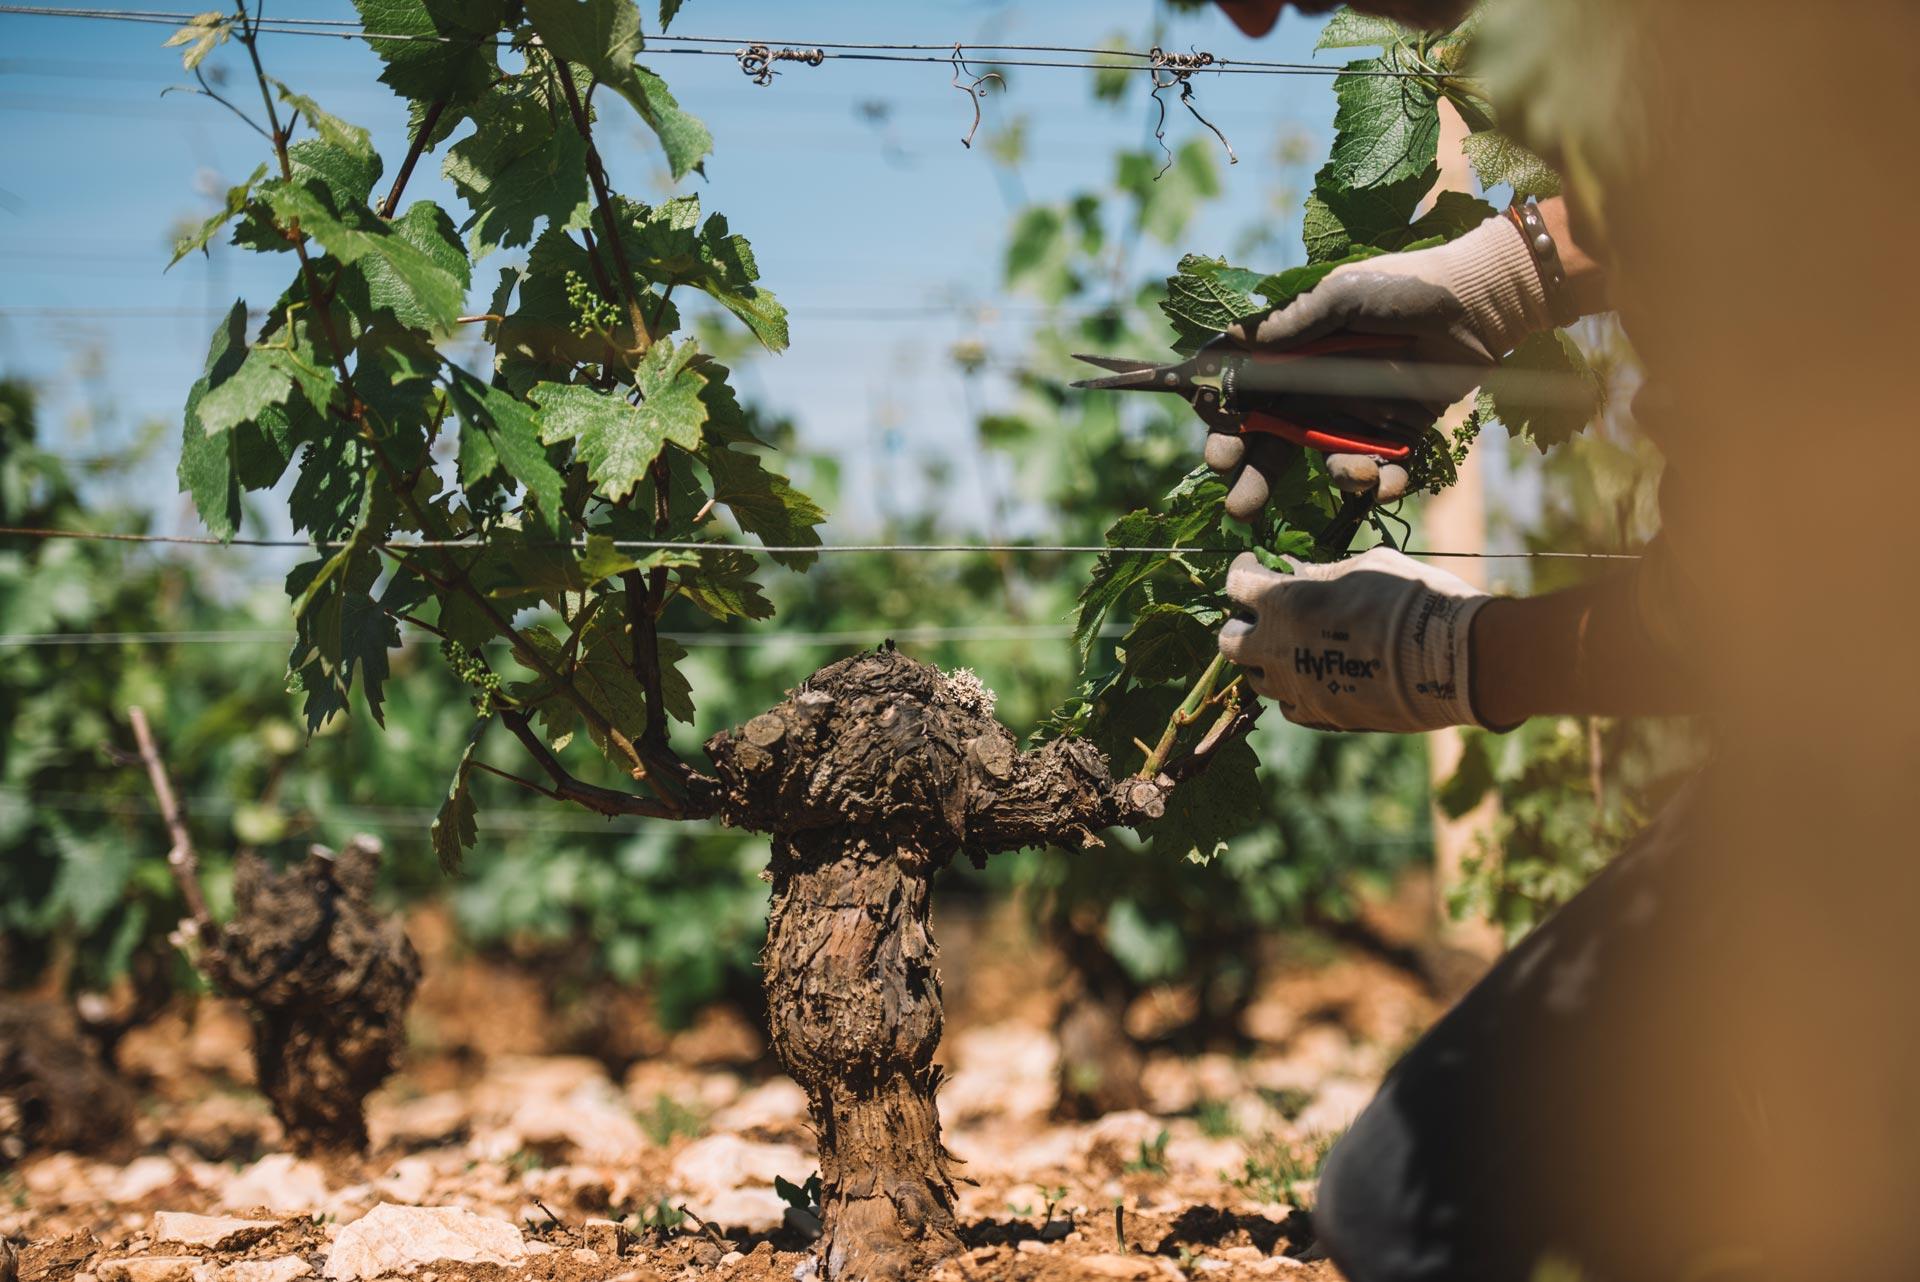 Formazione scelta germogli   Domaine Leroy   Montrachet   Bourgogne